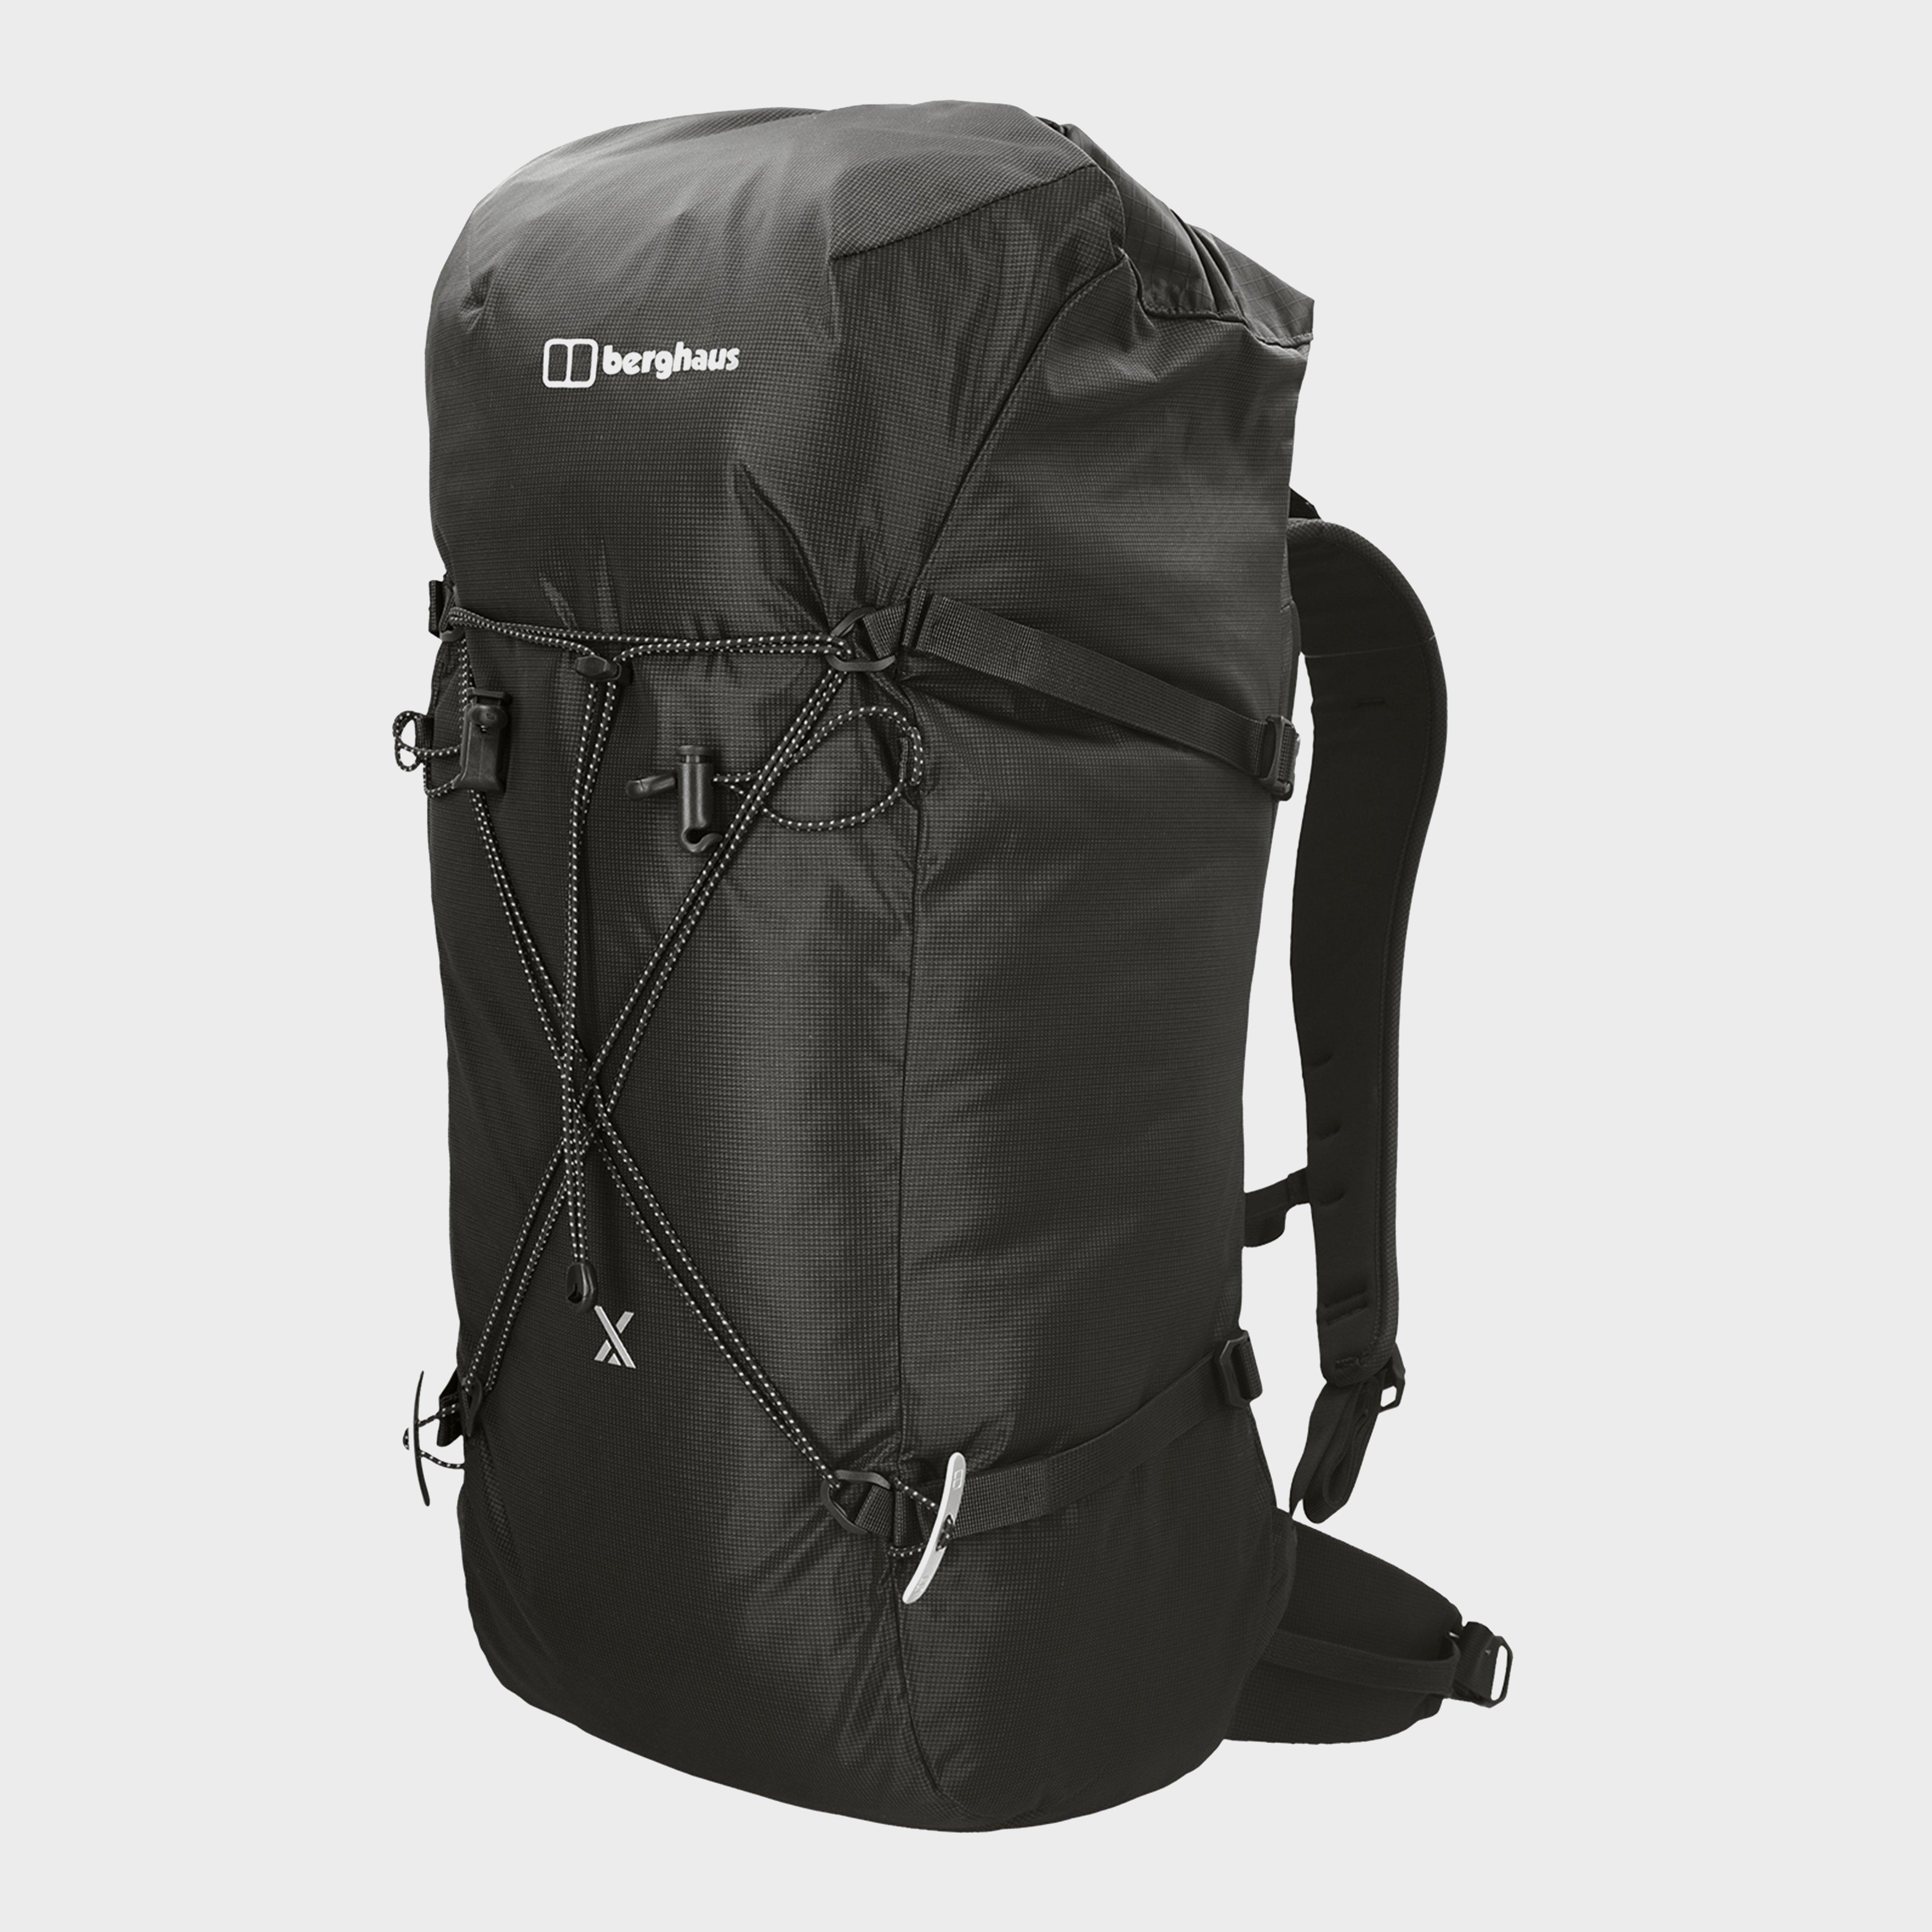 Berghaus Alpine 45L Backpack, Black